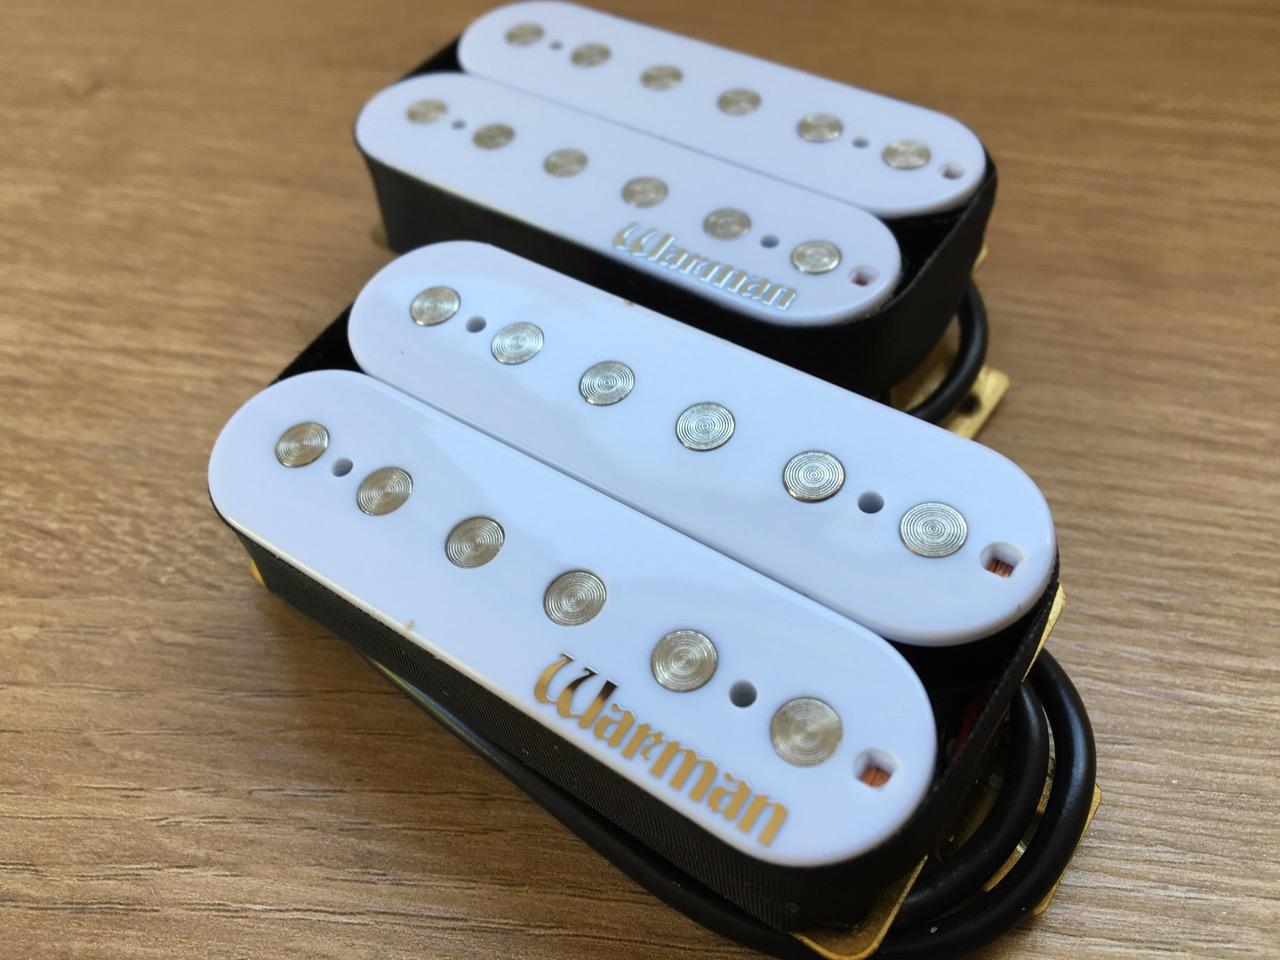 Warman Guitars Lil/' White Devils Matched pair of humbucking pickups 11.5 kOhm